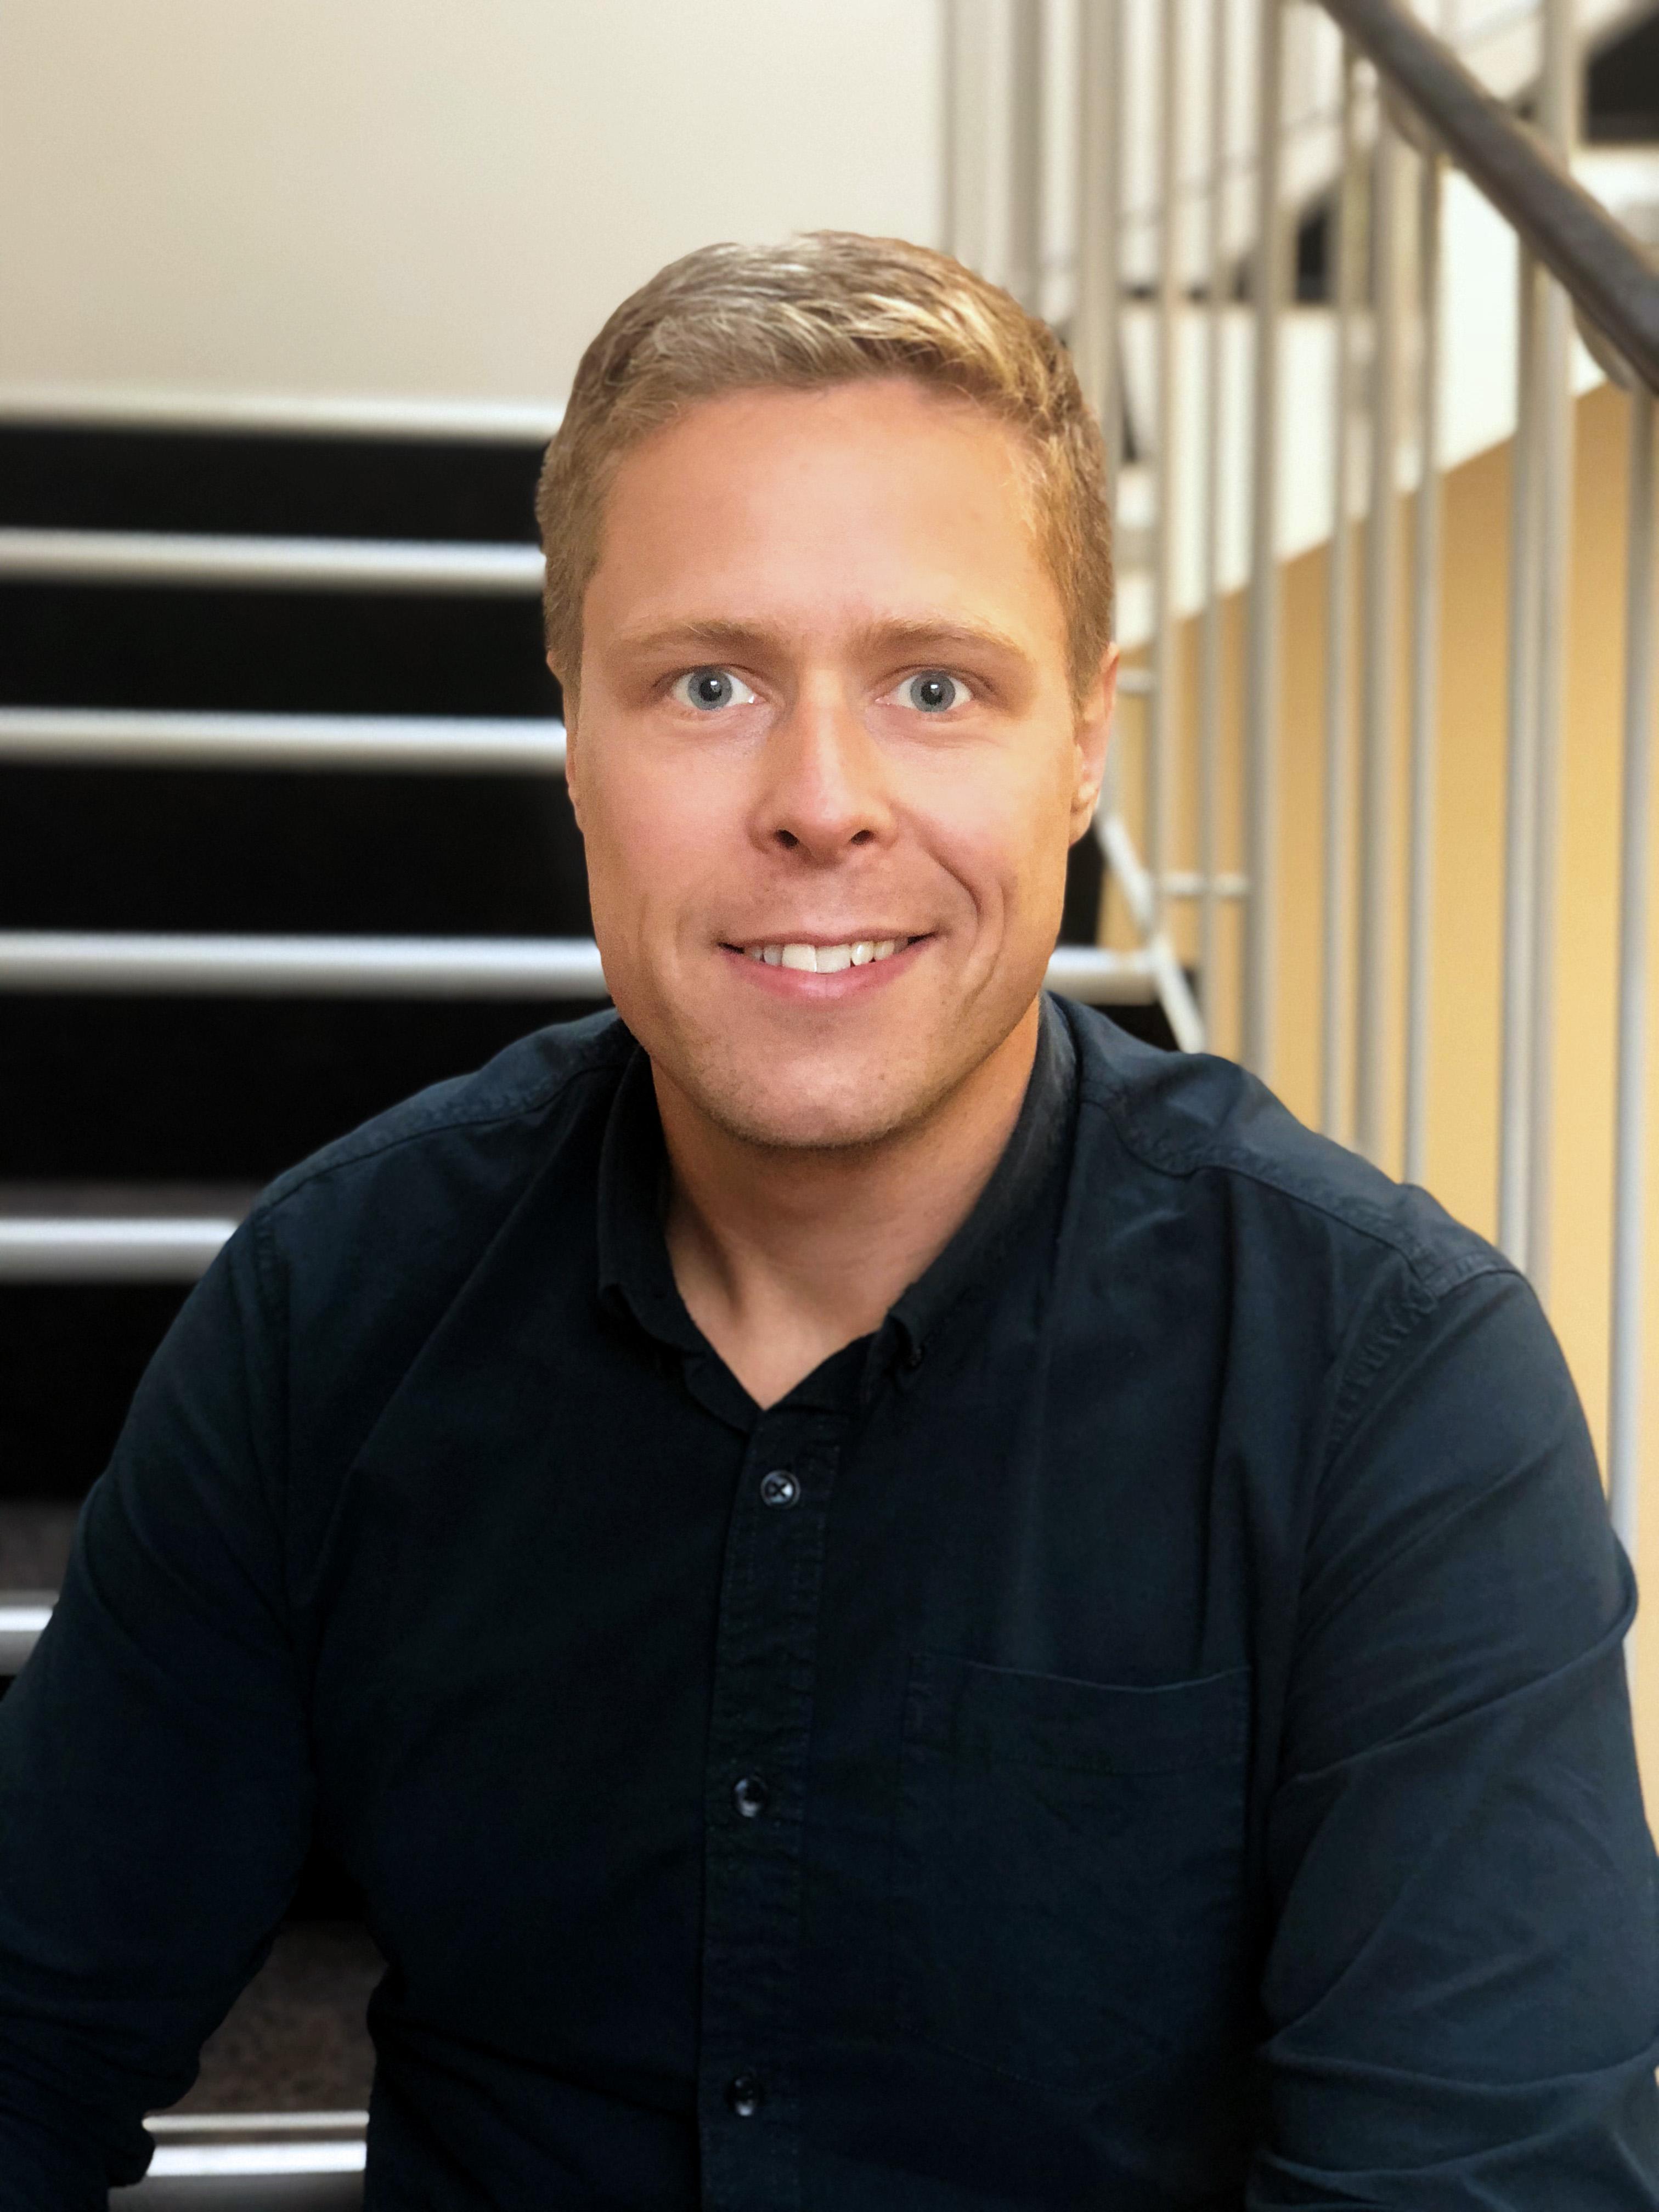 René Jespersen - Partner & CTO